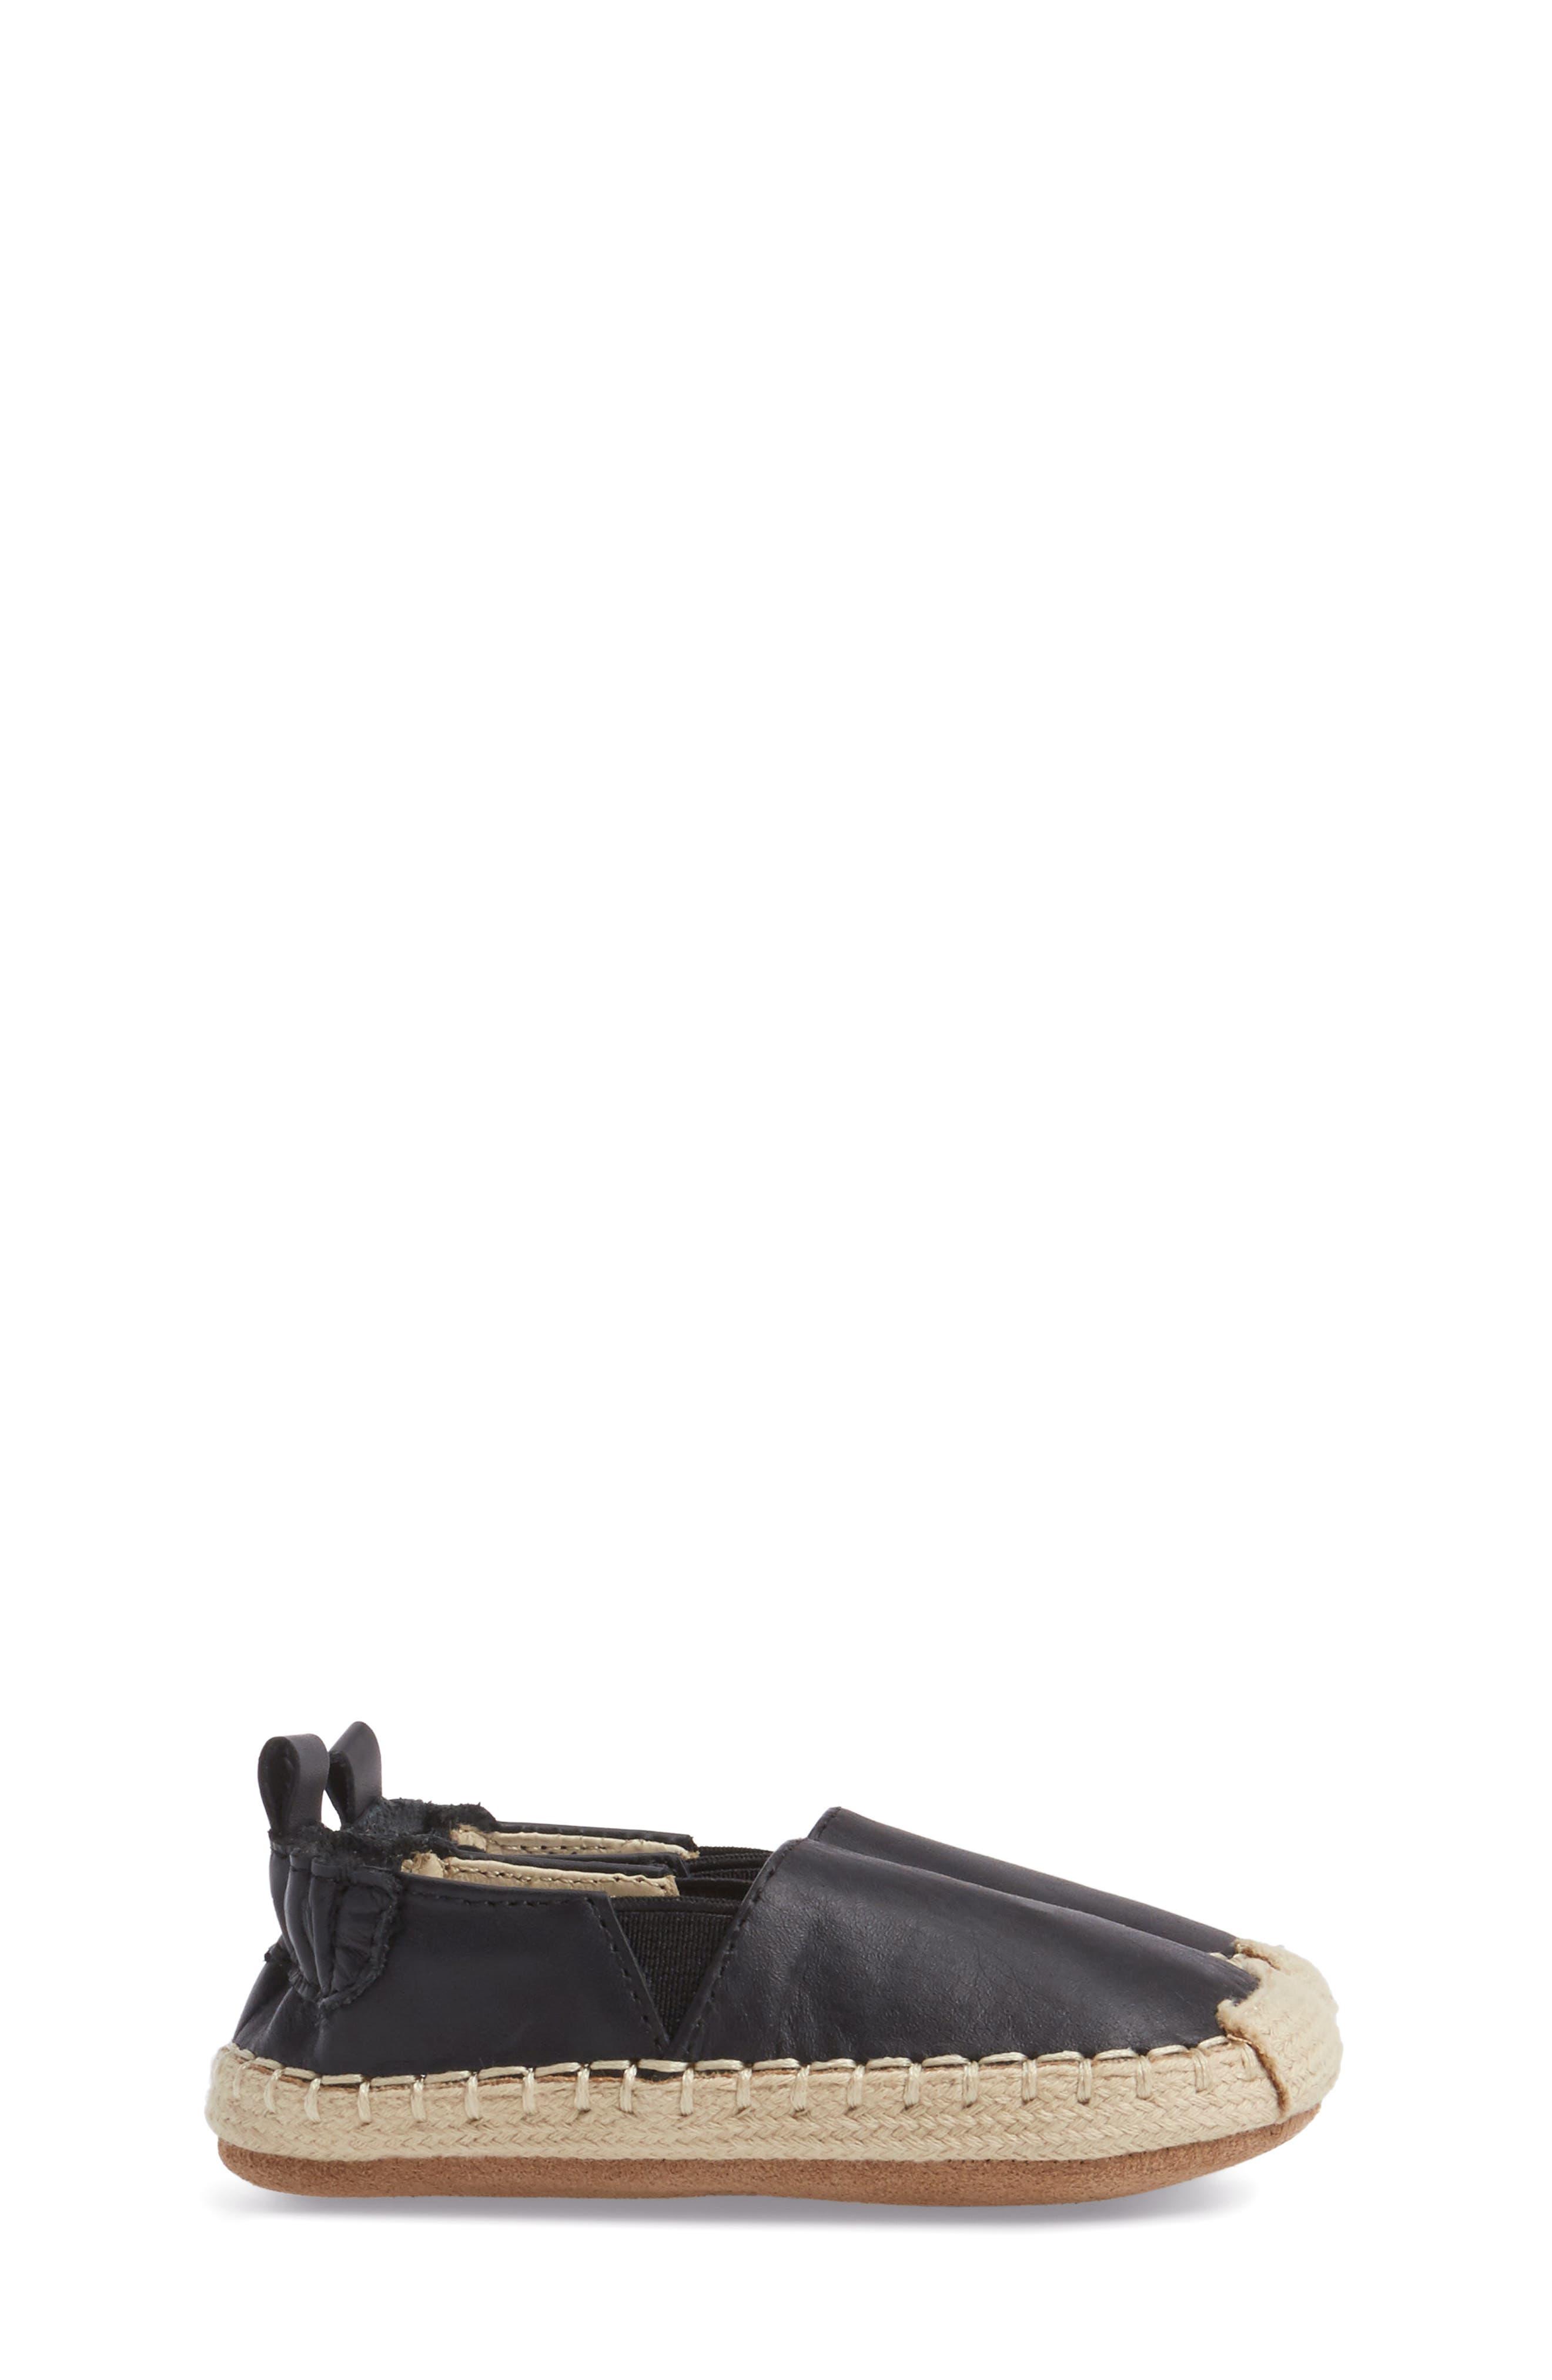 Ellie Crib Shoe,                             Alternate thumbnail 3, color,                             Black Leather